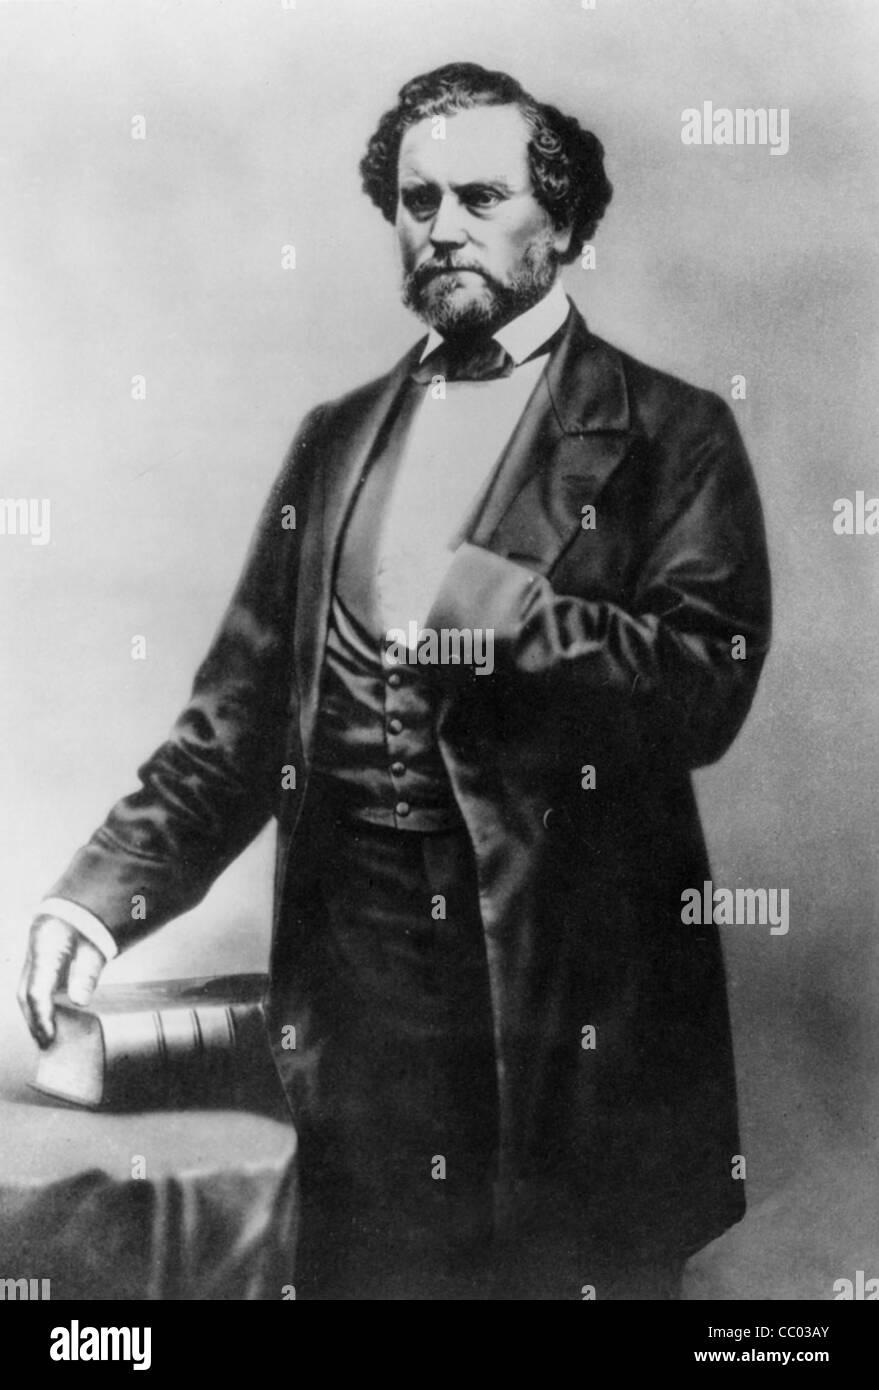 Samuel Colt Leather